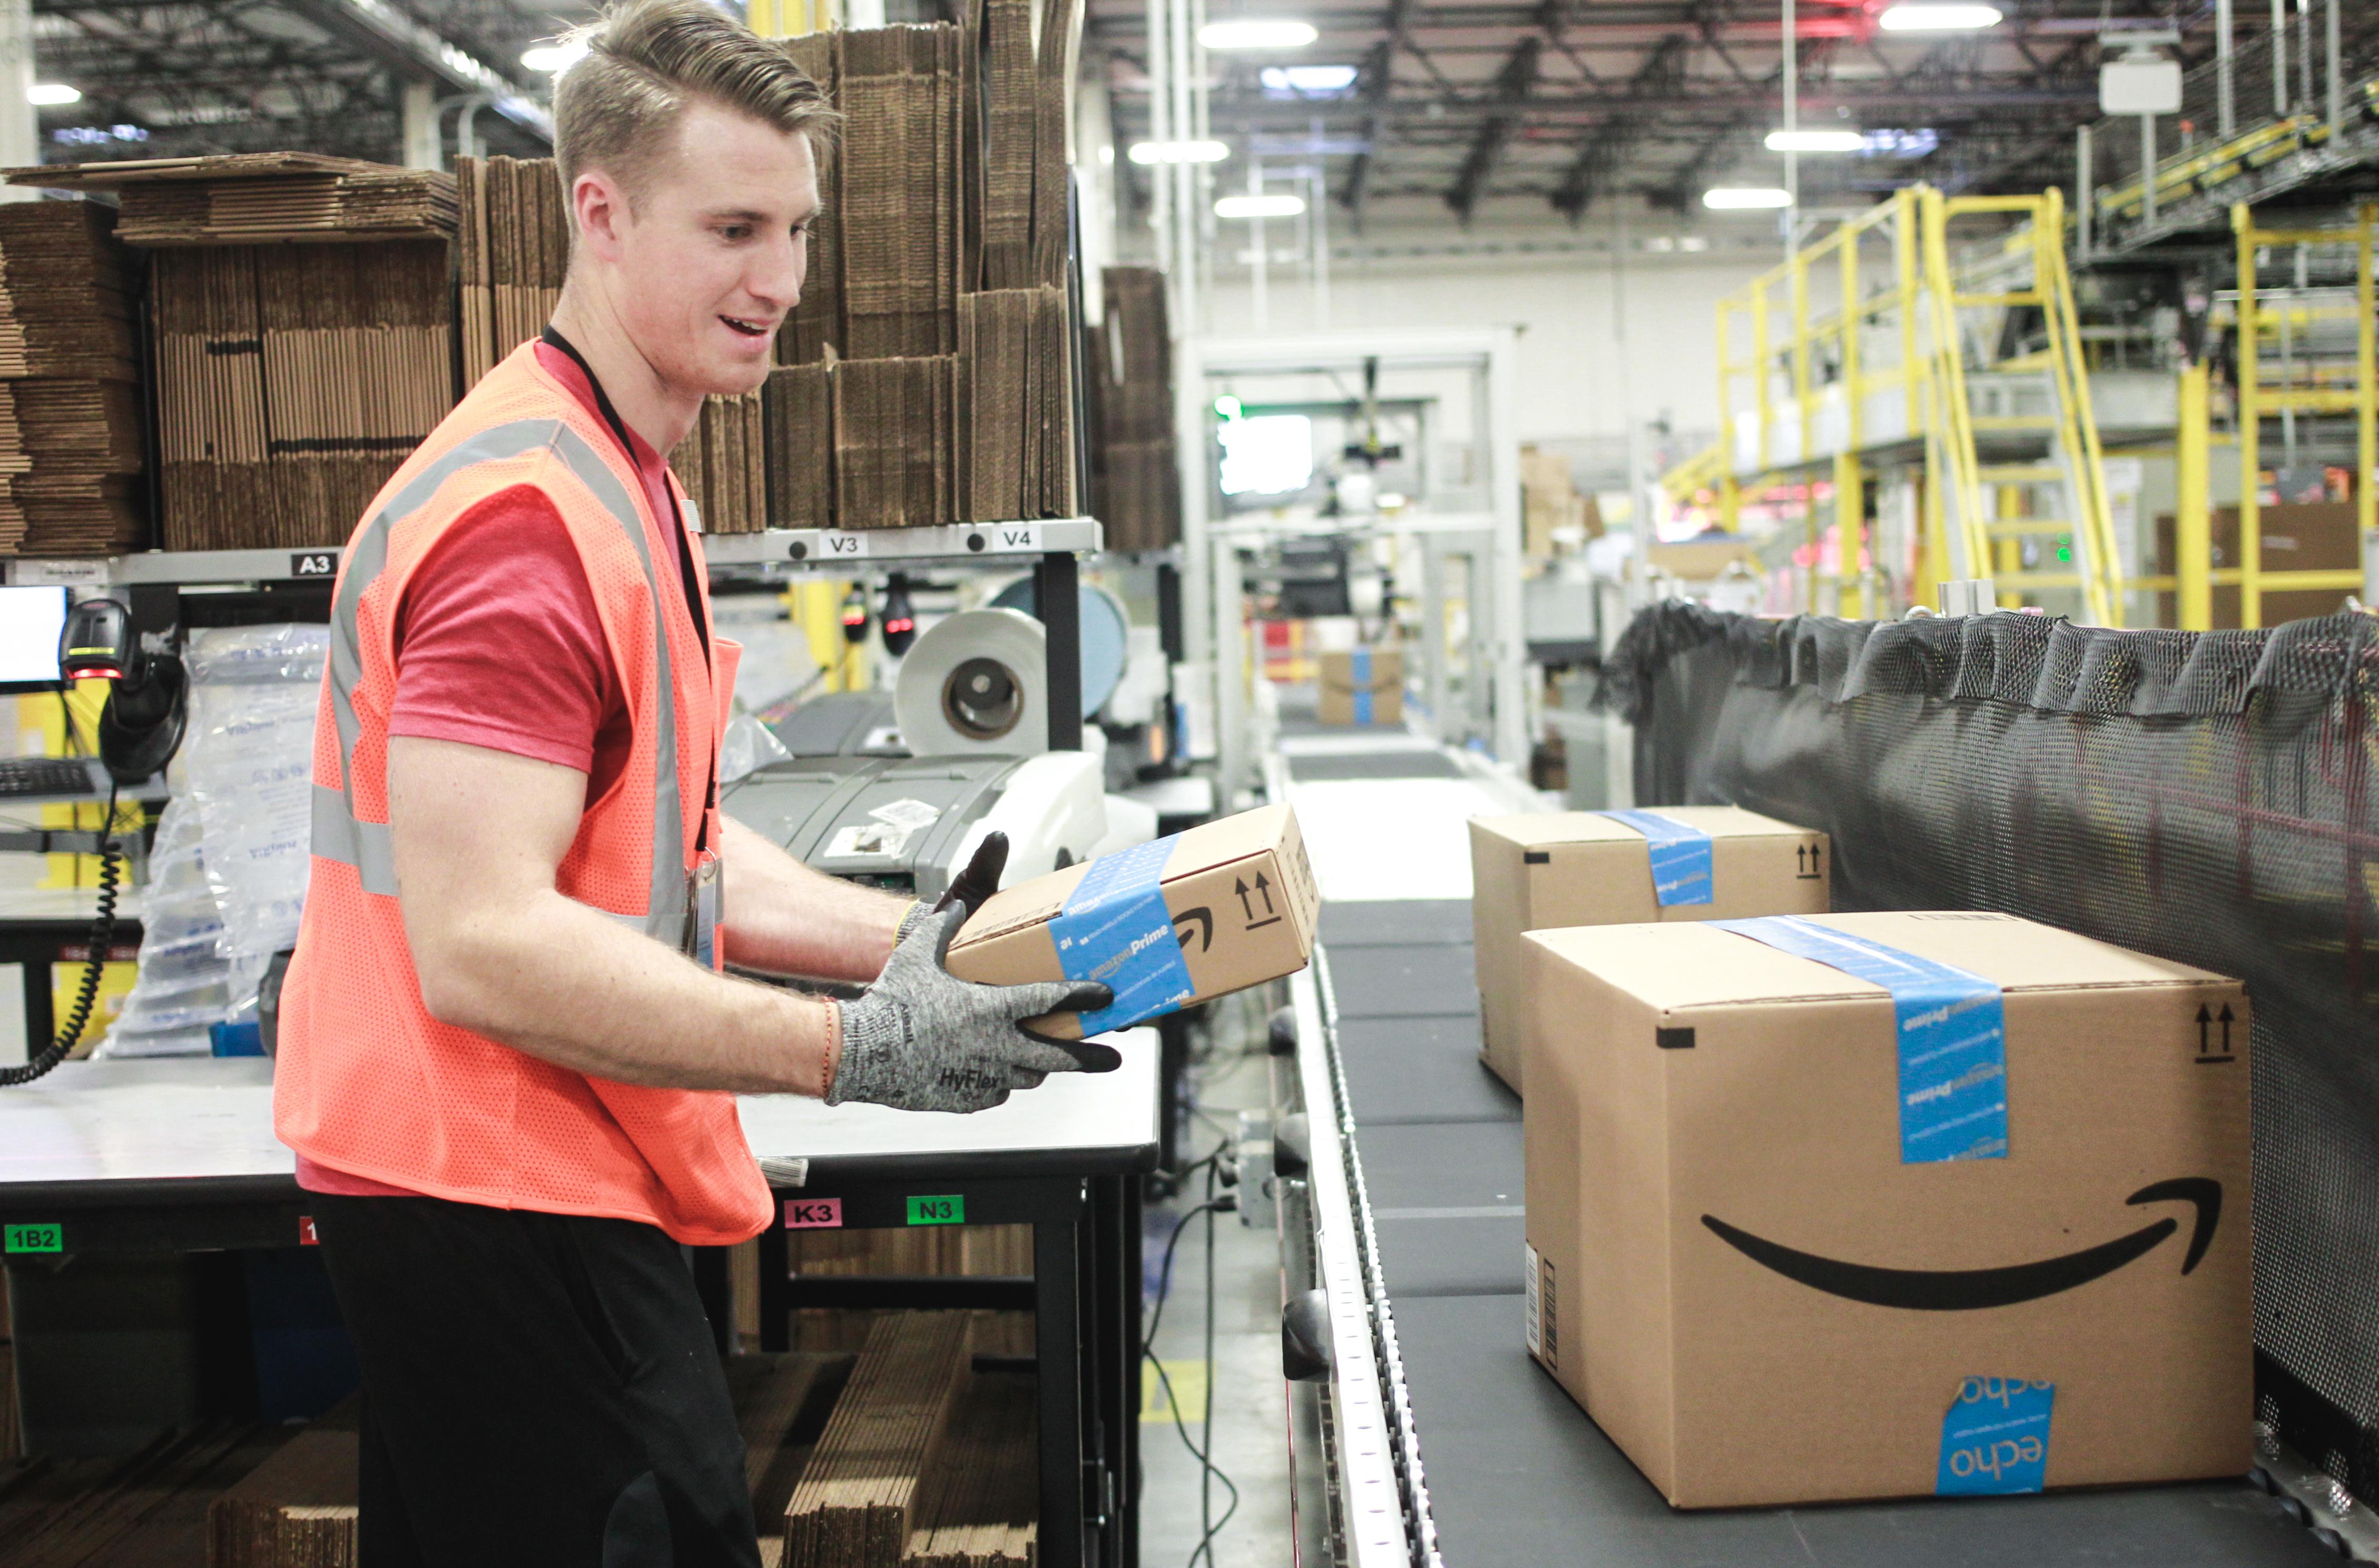 Amazon boxes coming down a conveyor belt